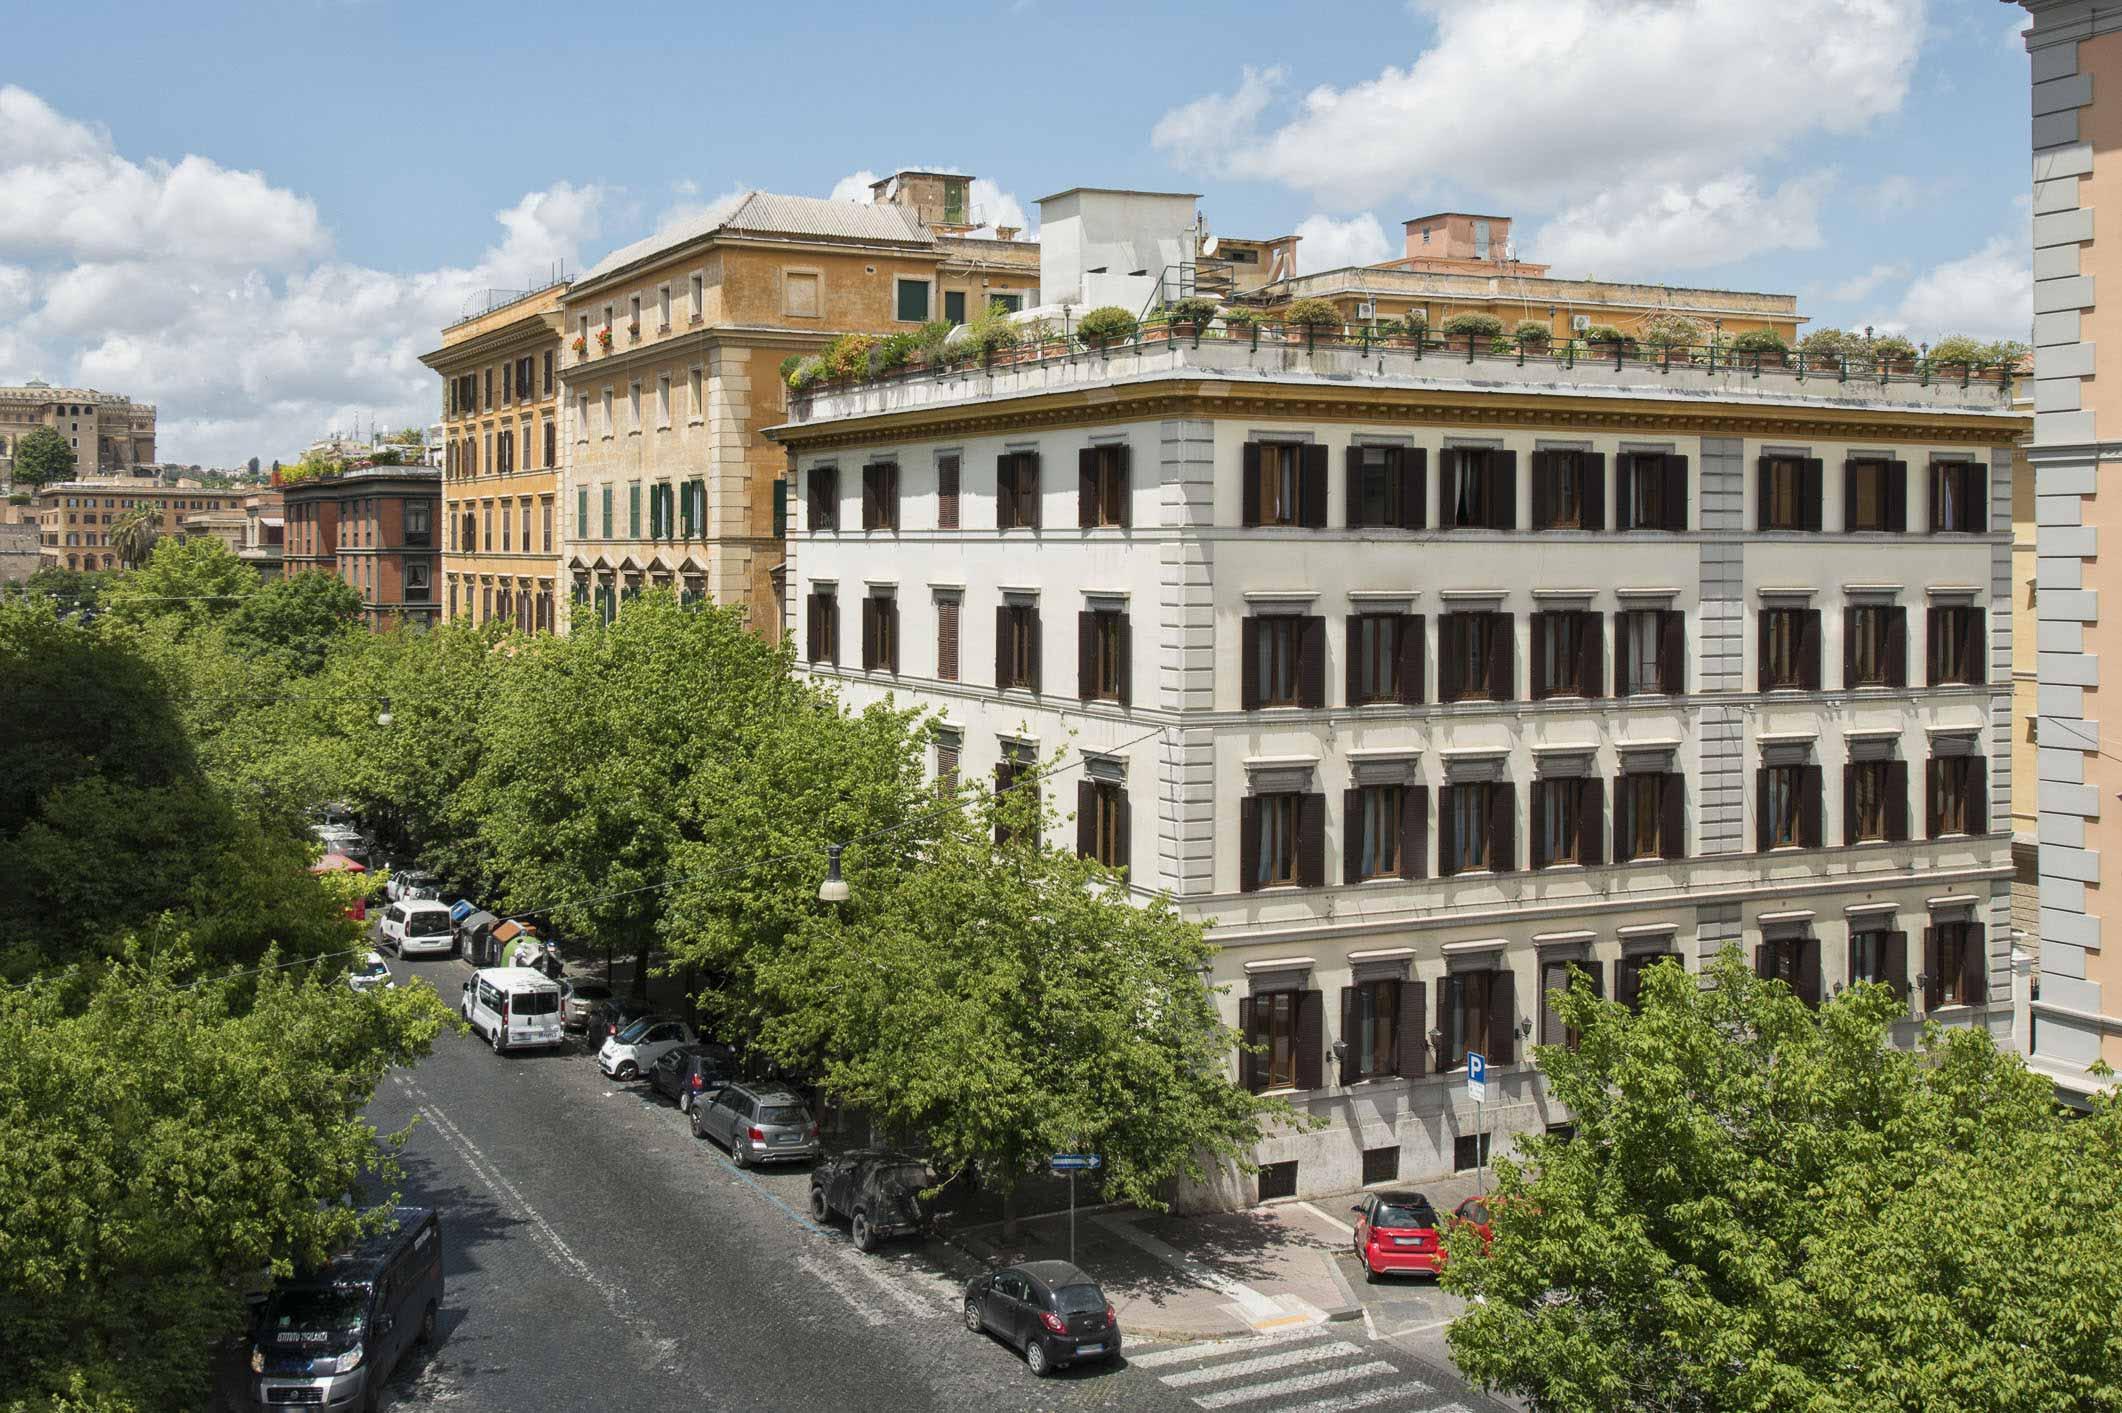 Fotografo per hotel a Roma – Atlante Garden #13